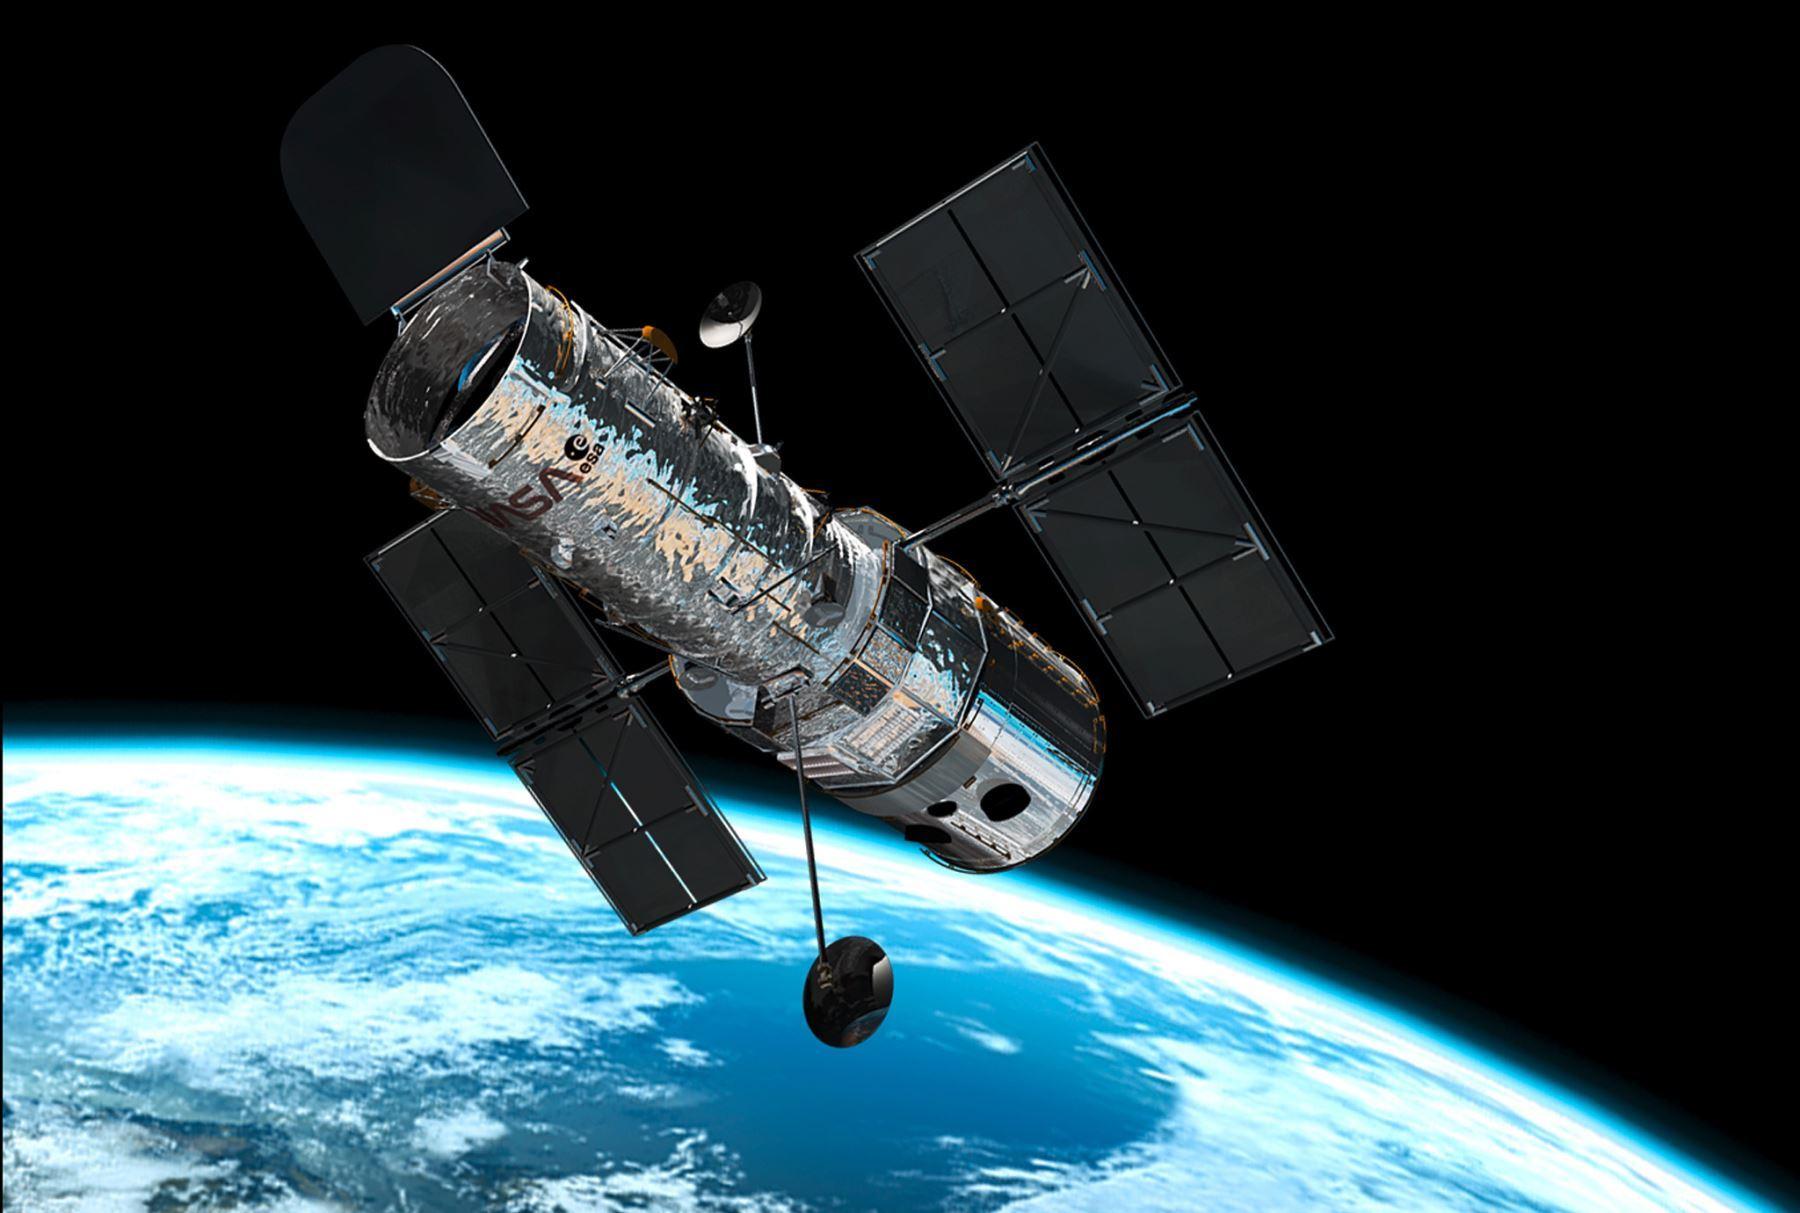 La NASA logra reactivar el famoso telescopio espacial Hubble